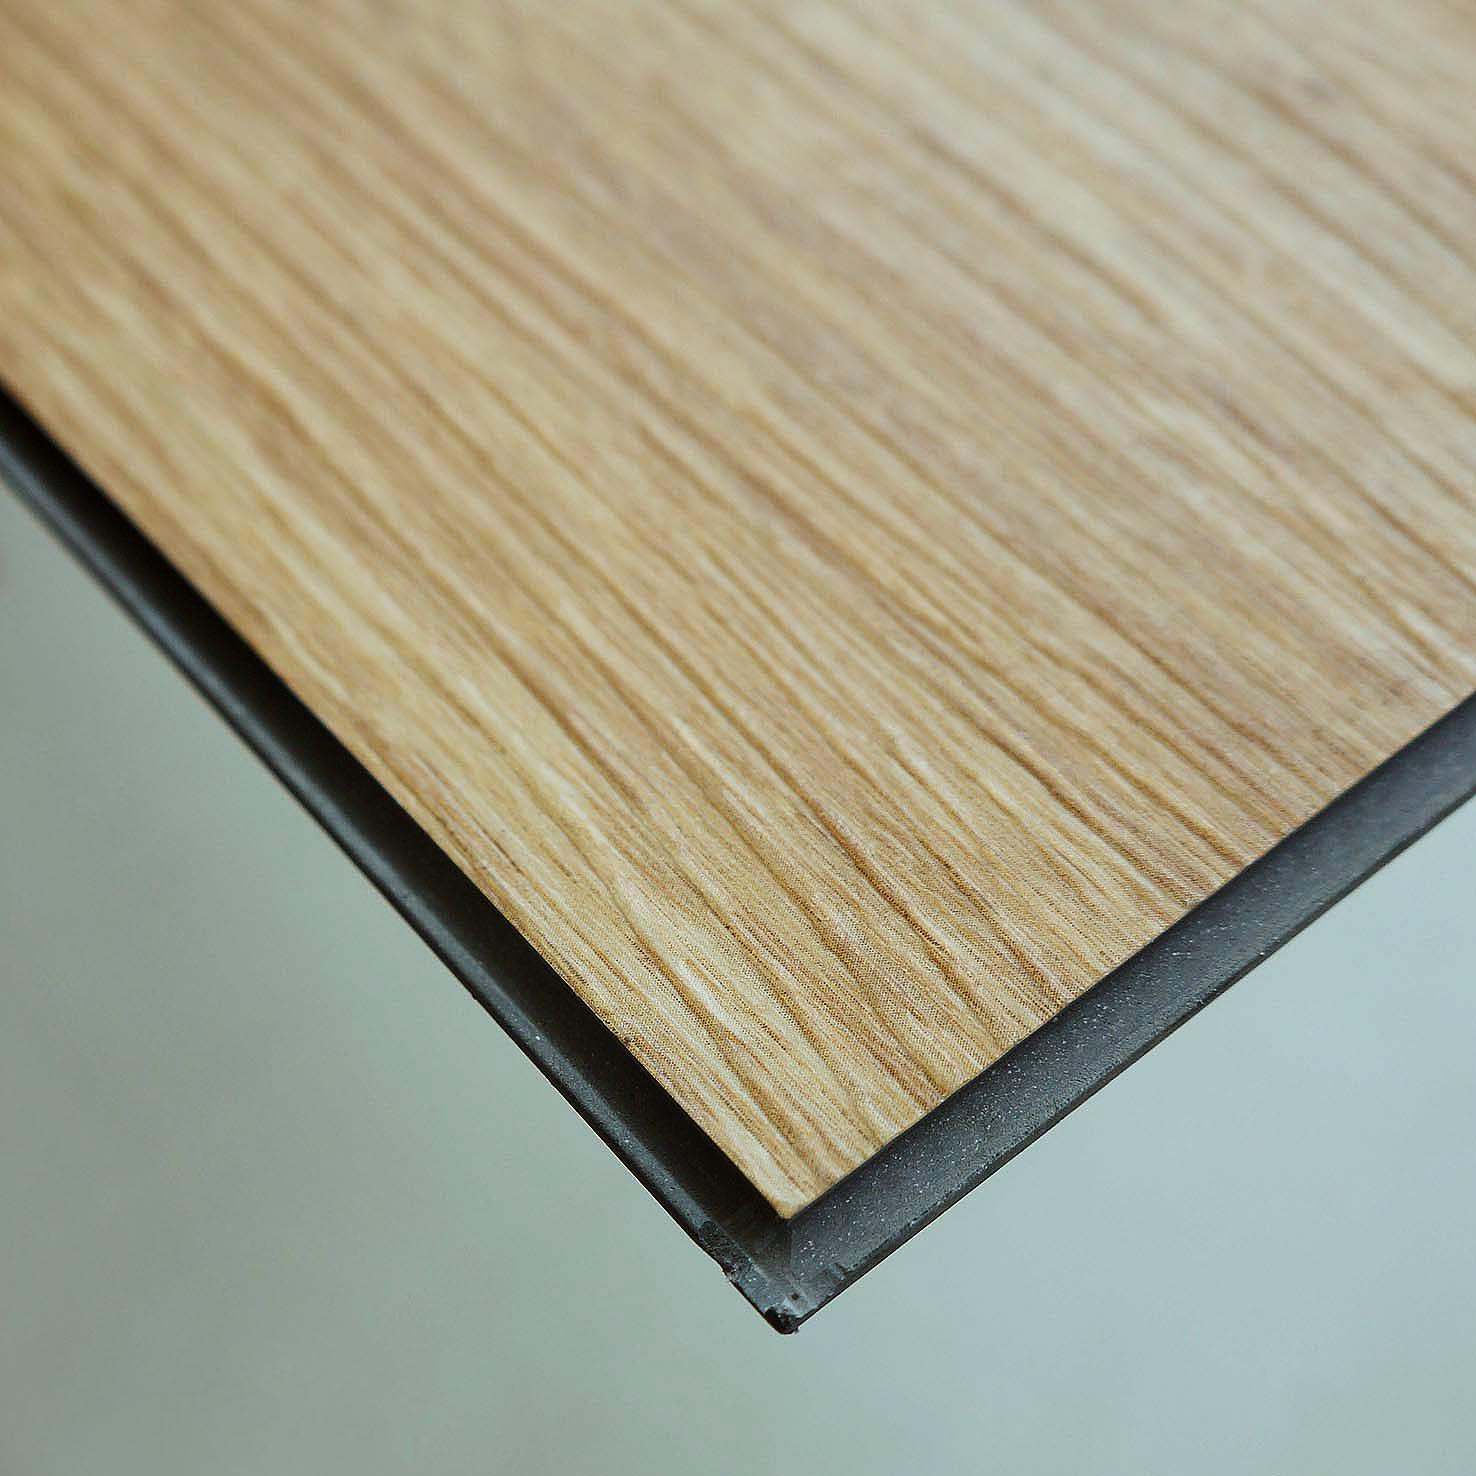 Looks Wooden Wear Resistance Pvc Click Vinyl Flooring For